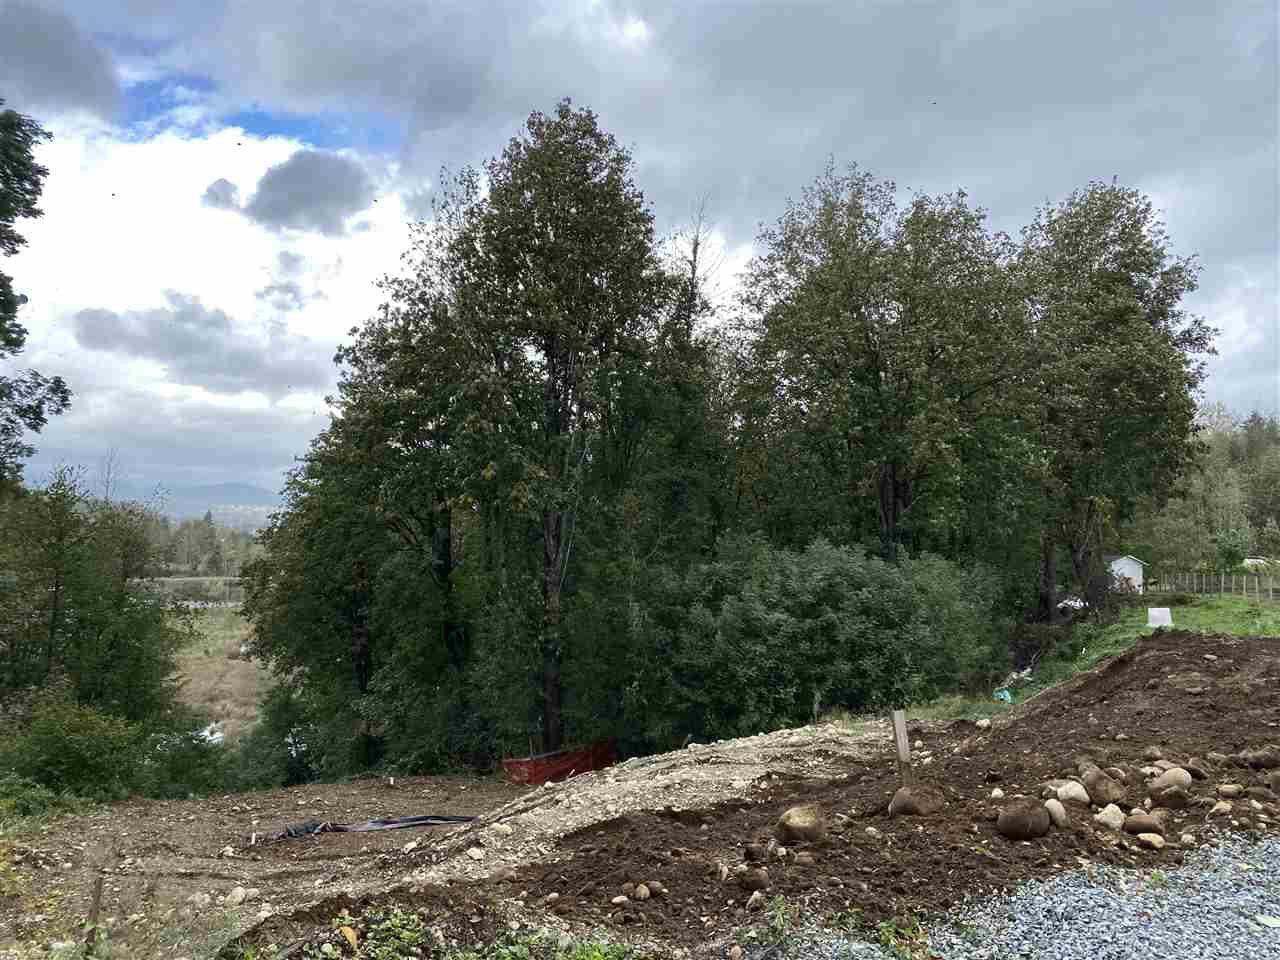 Main Photo: 34011 PRATT Crescent in Abbotsford: Central Abbotsford Land for sale : MLS®# R2508288